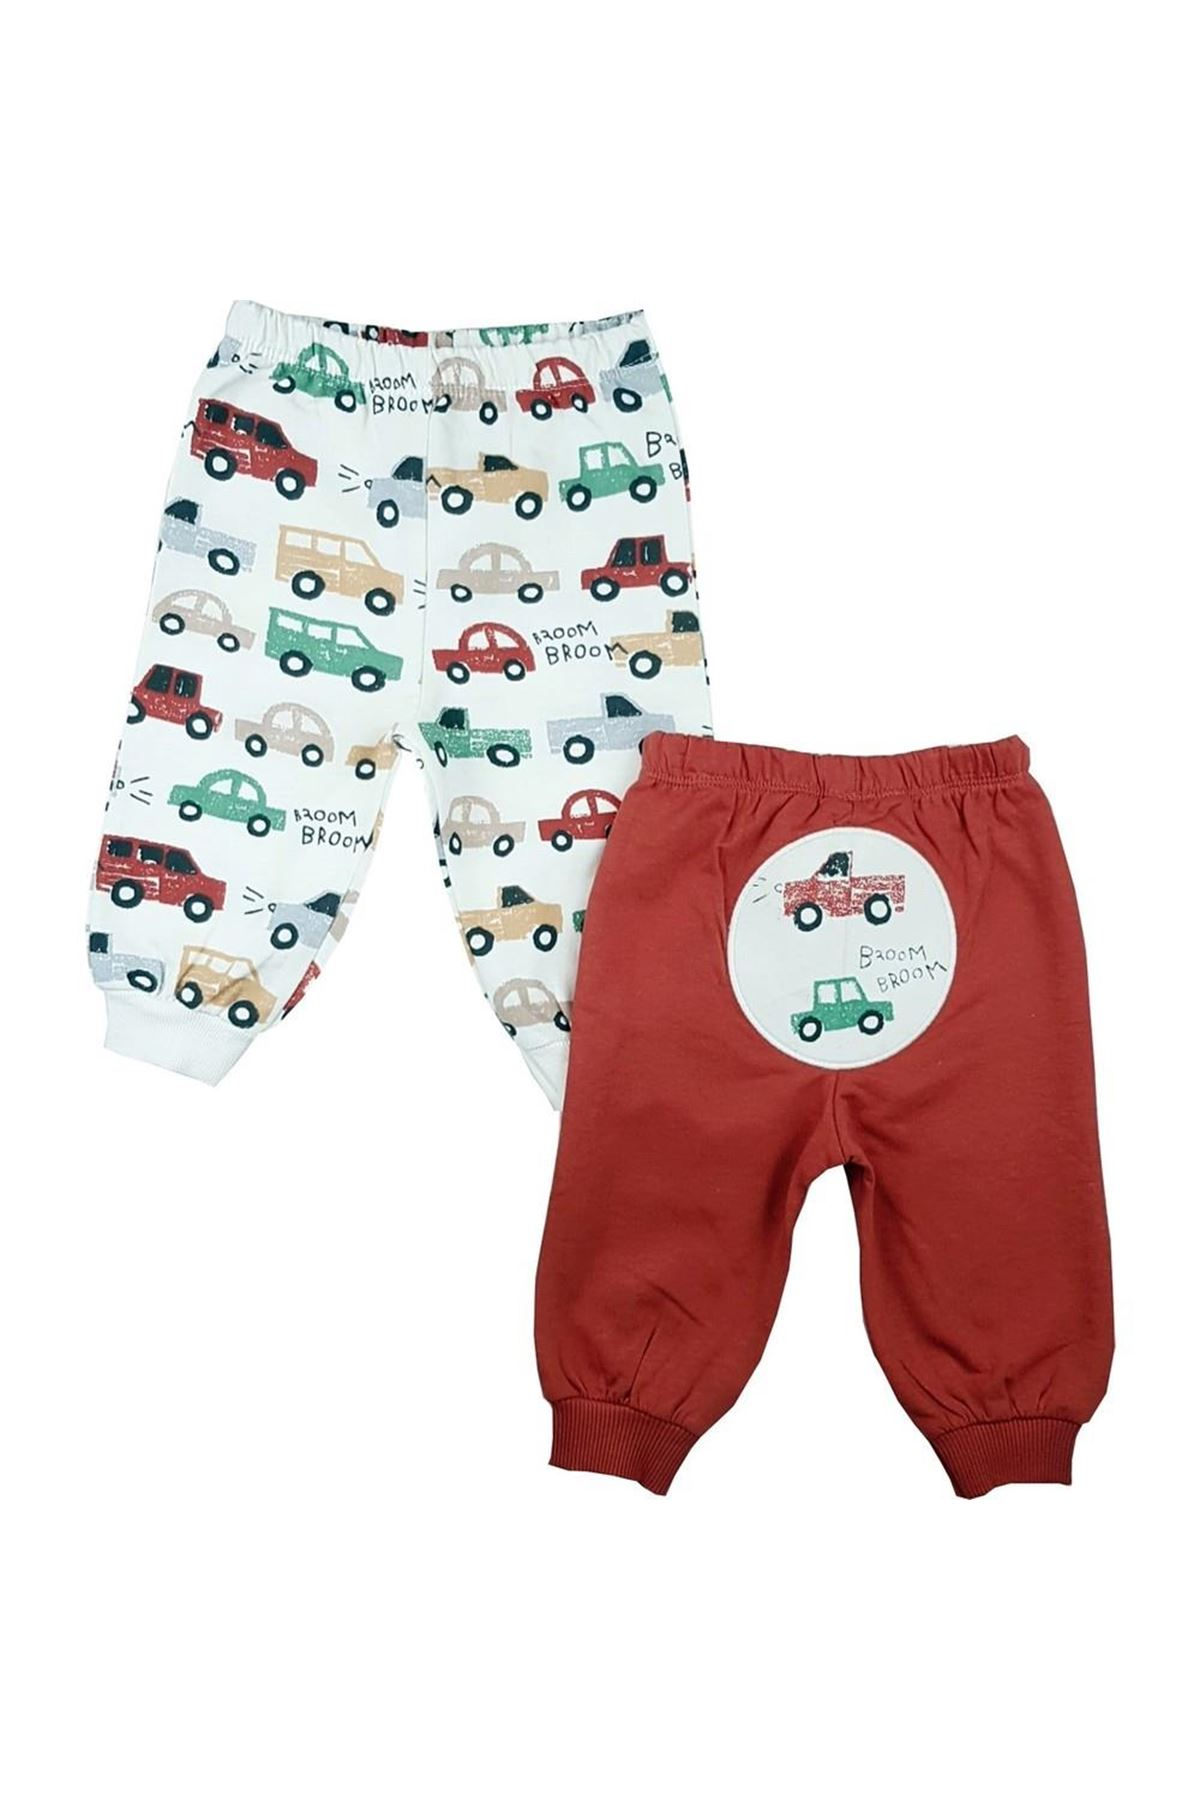 Luggi Baby 2li Bebe Pantolon LG-6056 Karışık Renkli